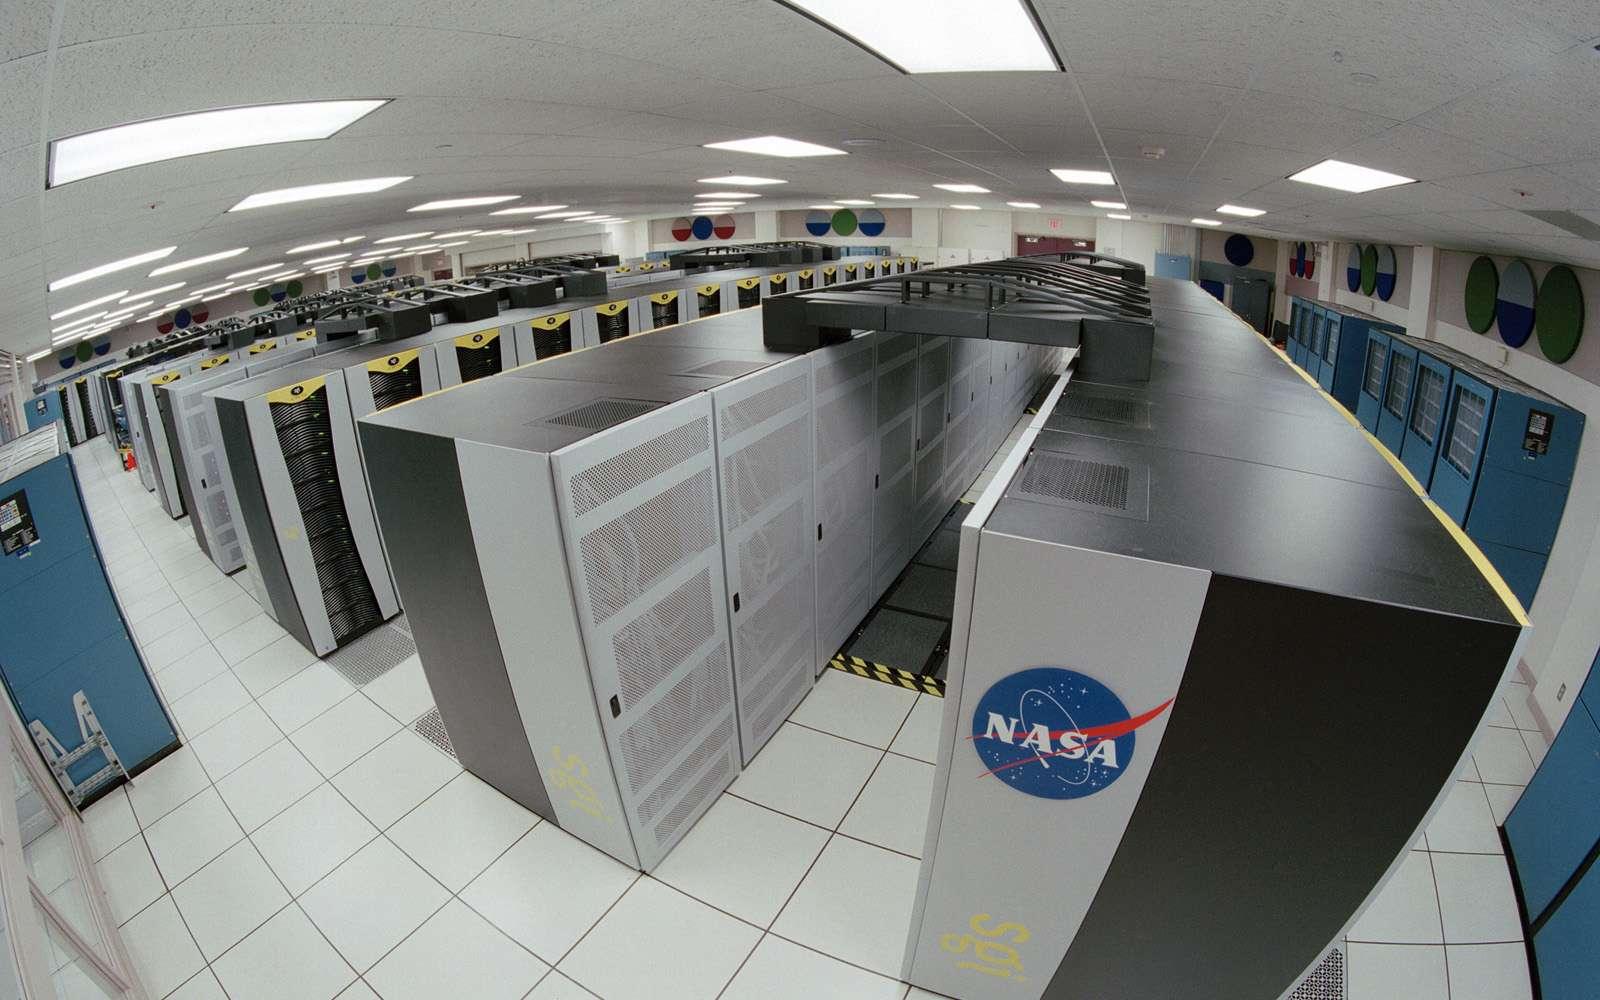 Le supercalculateur de la Nasa, en Californie. © Trower, Nasa, Wikipedia, DP